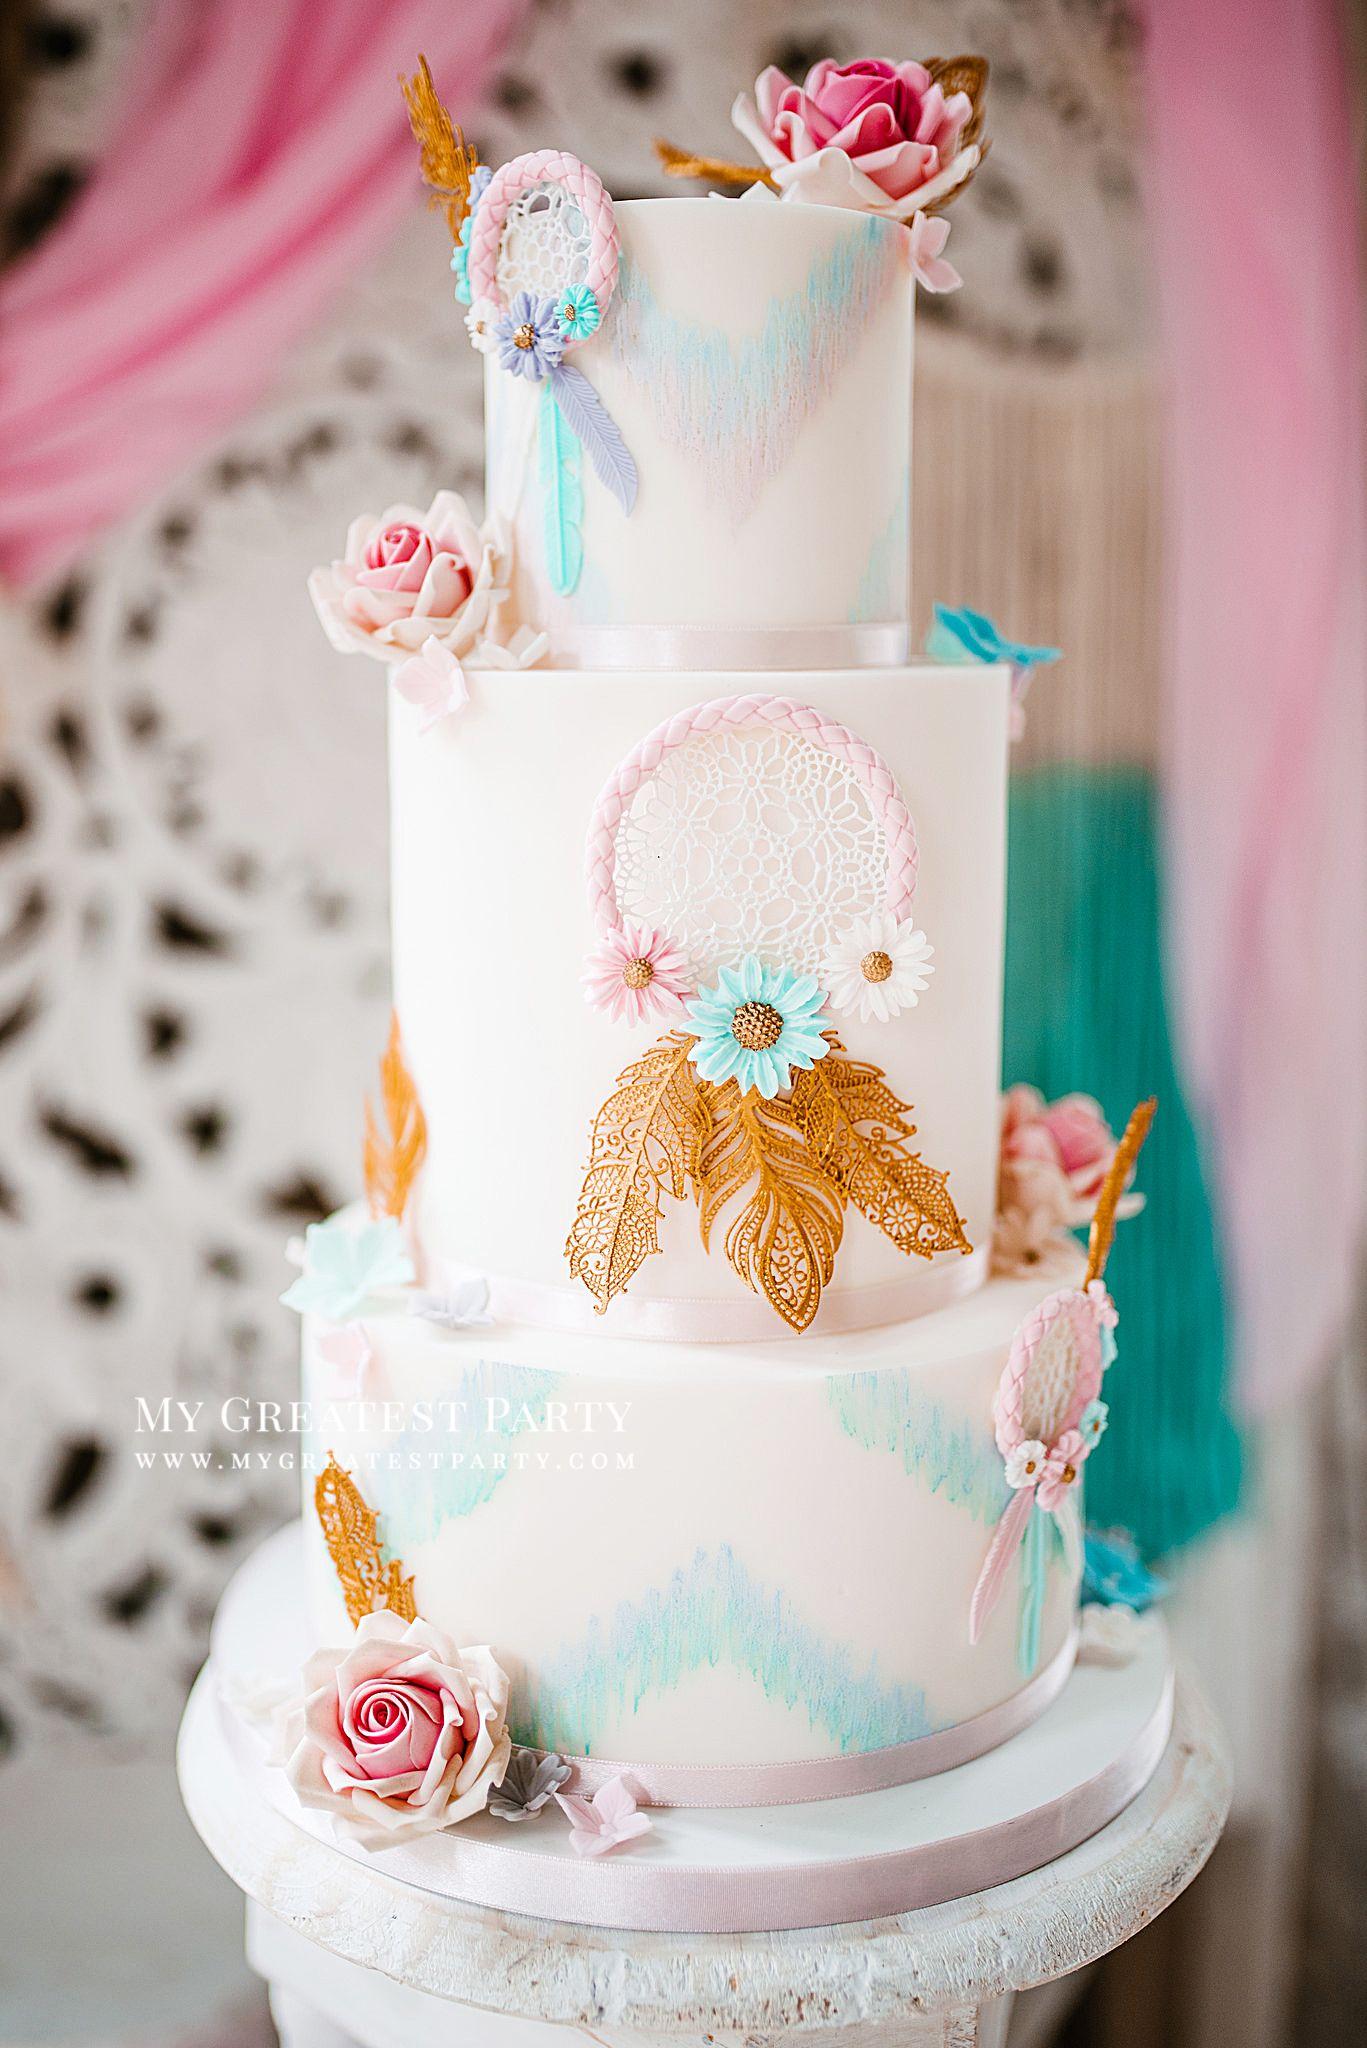 Babyshower Bohemian Bohemian Babyshower Bohemian Babyshower Theme Pastel Colors Babyshower In Pastel Cake